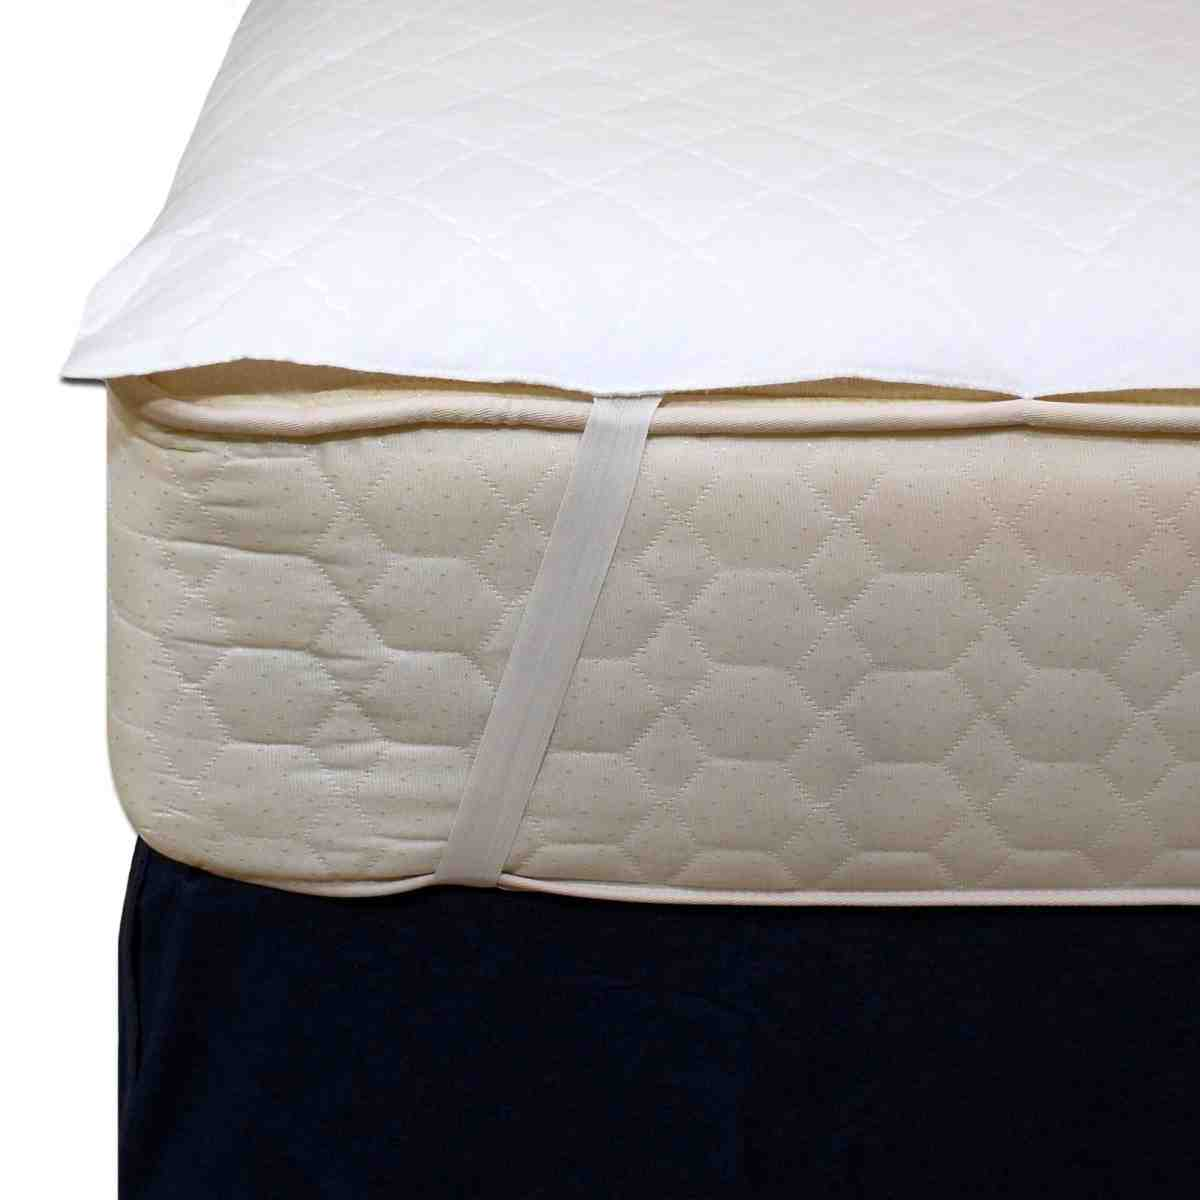 queen size waterproof mattress cover decor ideasdecor ideas. Black Bedroom Furniture Sets. Home Design Ideas